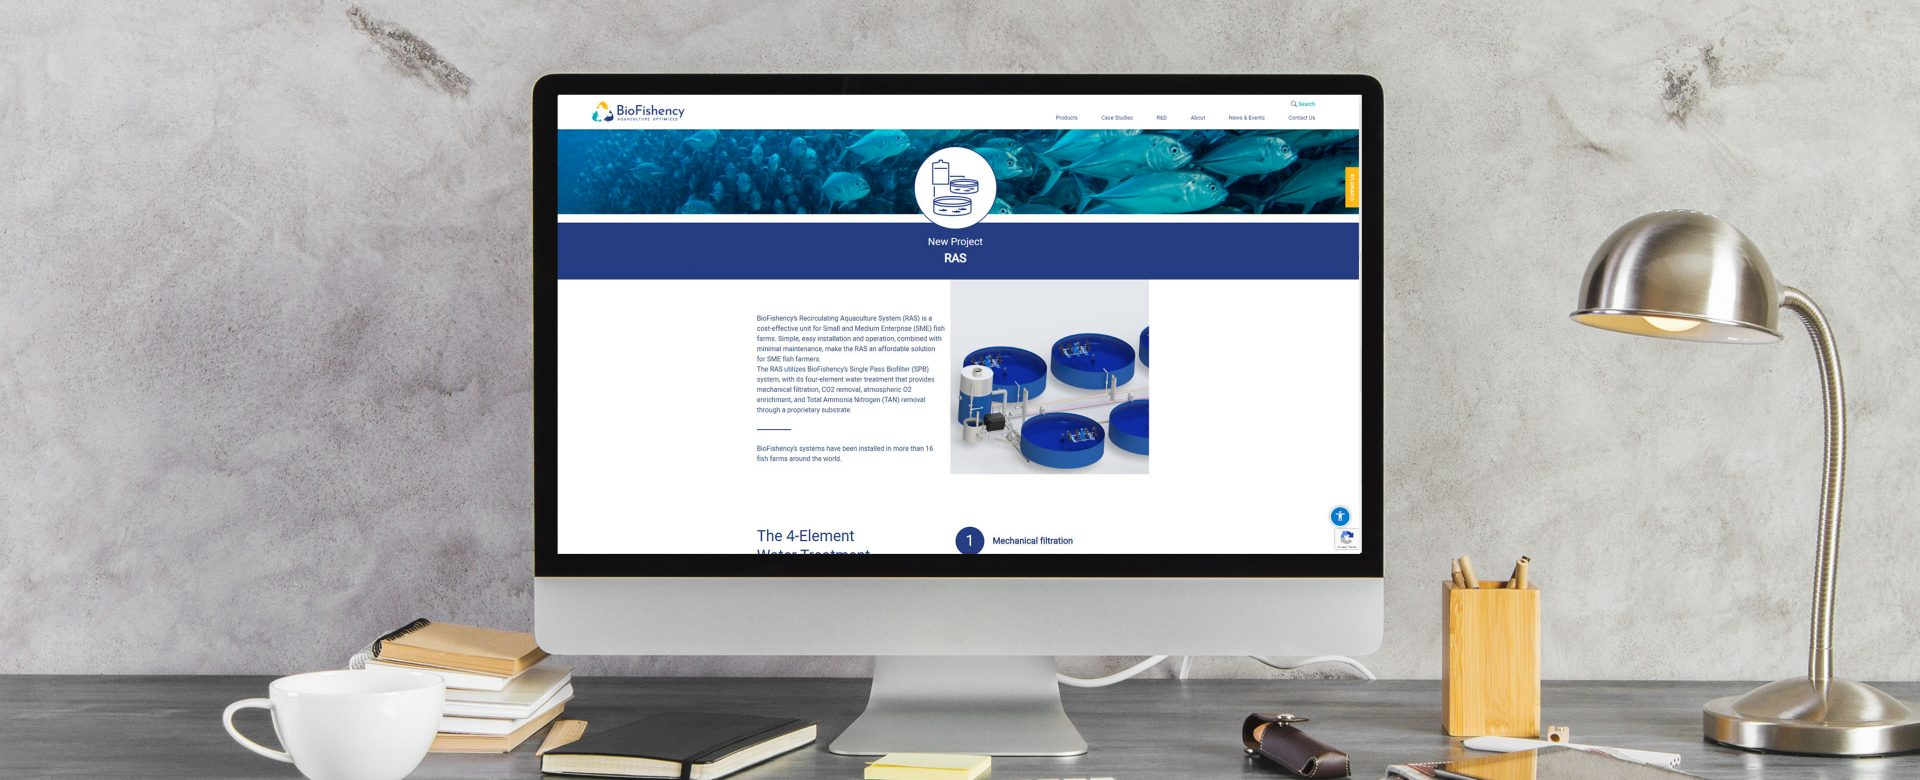 bioFishency web screen image